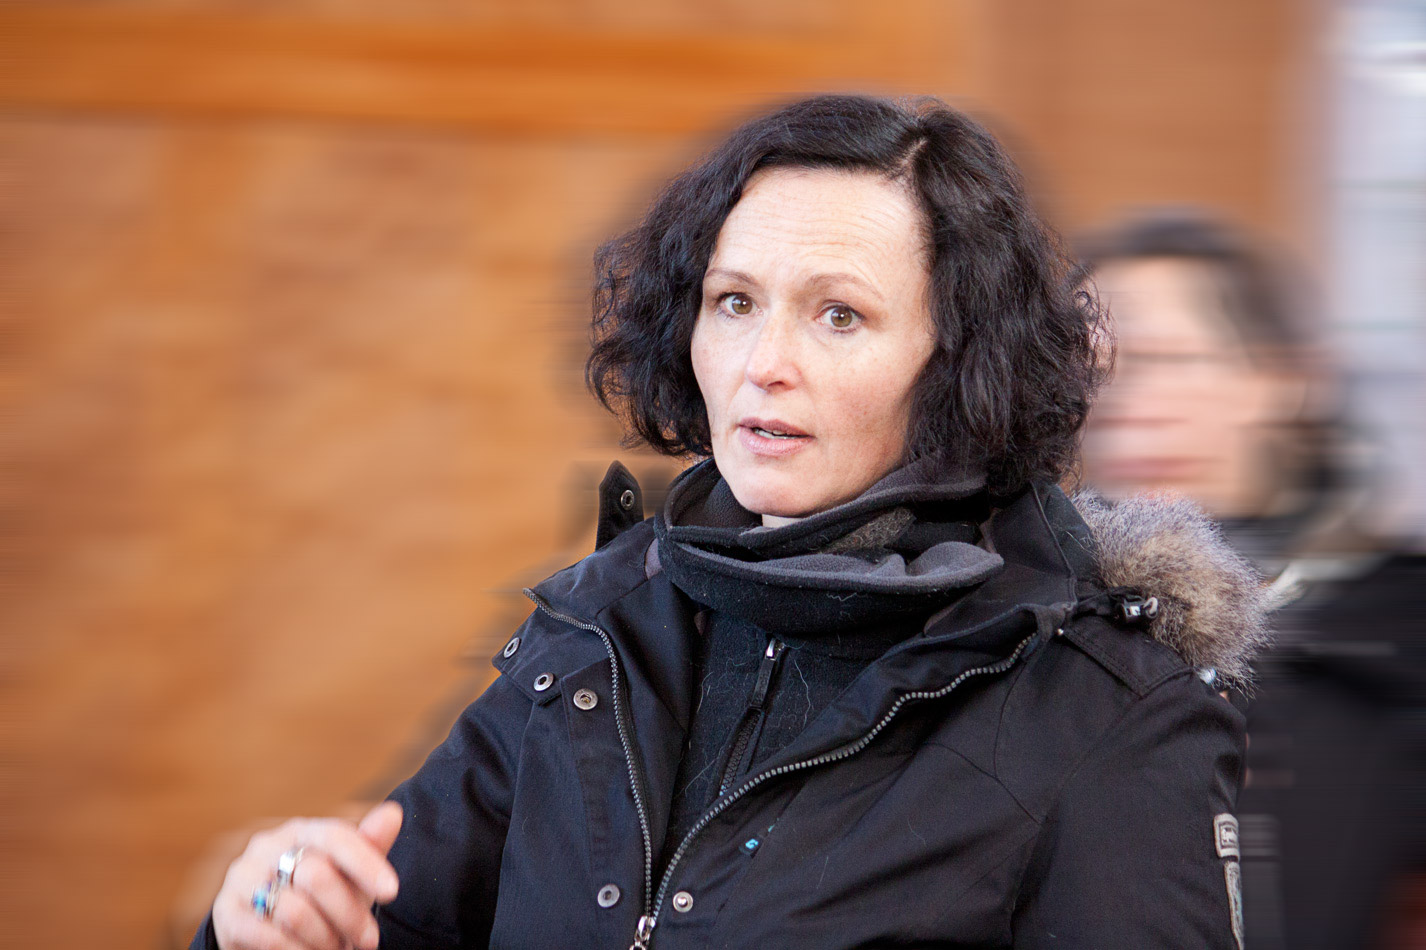 Ein Wochenende mit Maike Maja Nowak